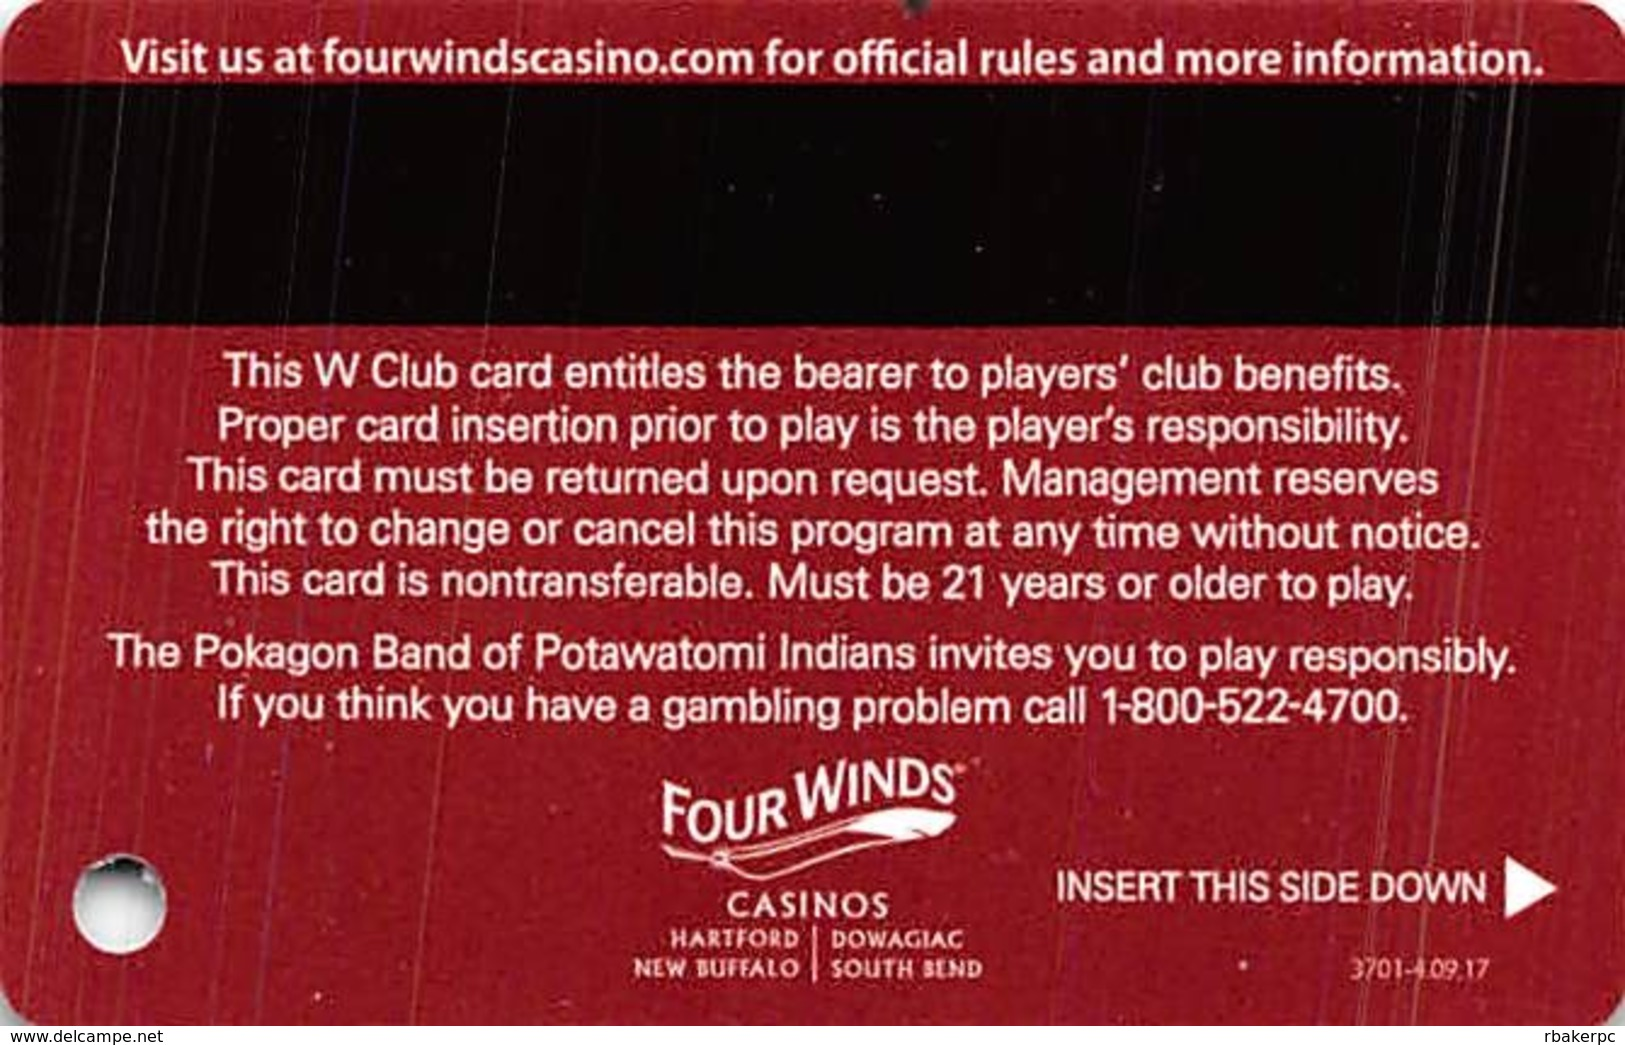 Four Winds Casino - Michigan - Slot Card - Players Club - 4 Locations In Reverse Logo - Casino Cards